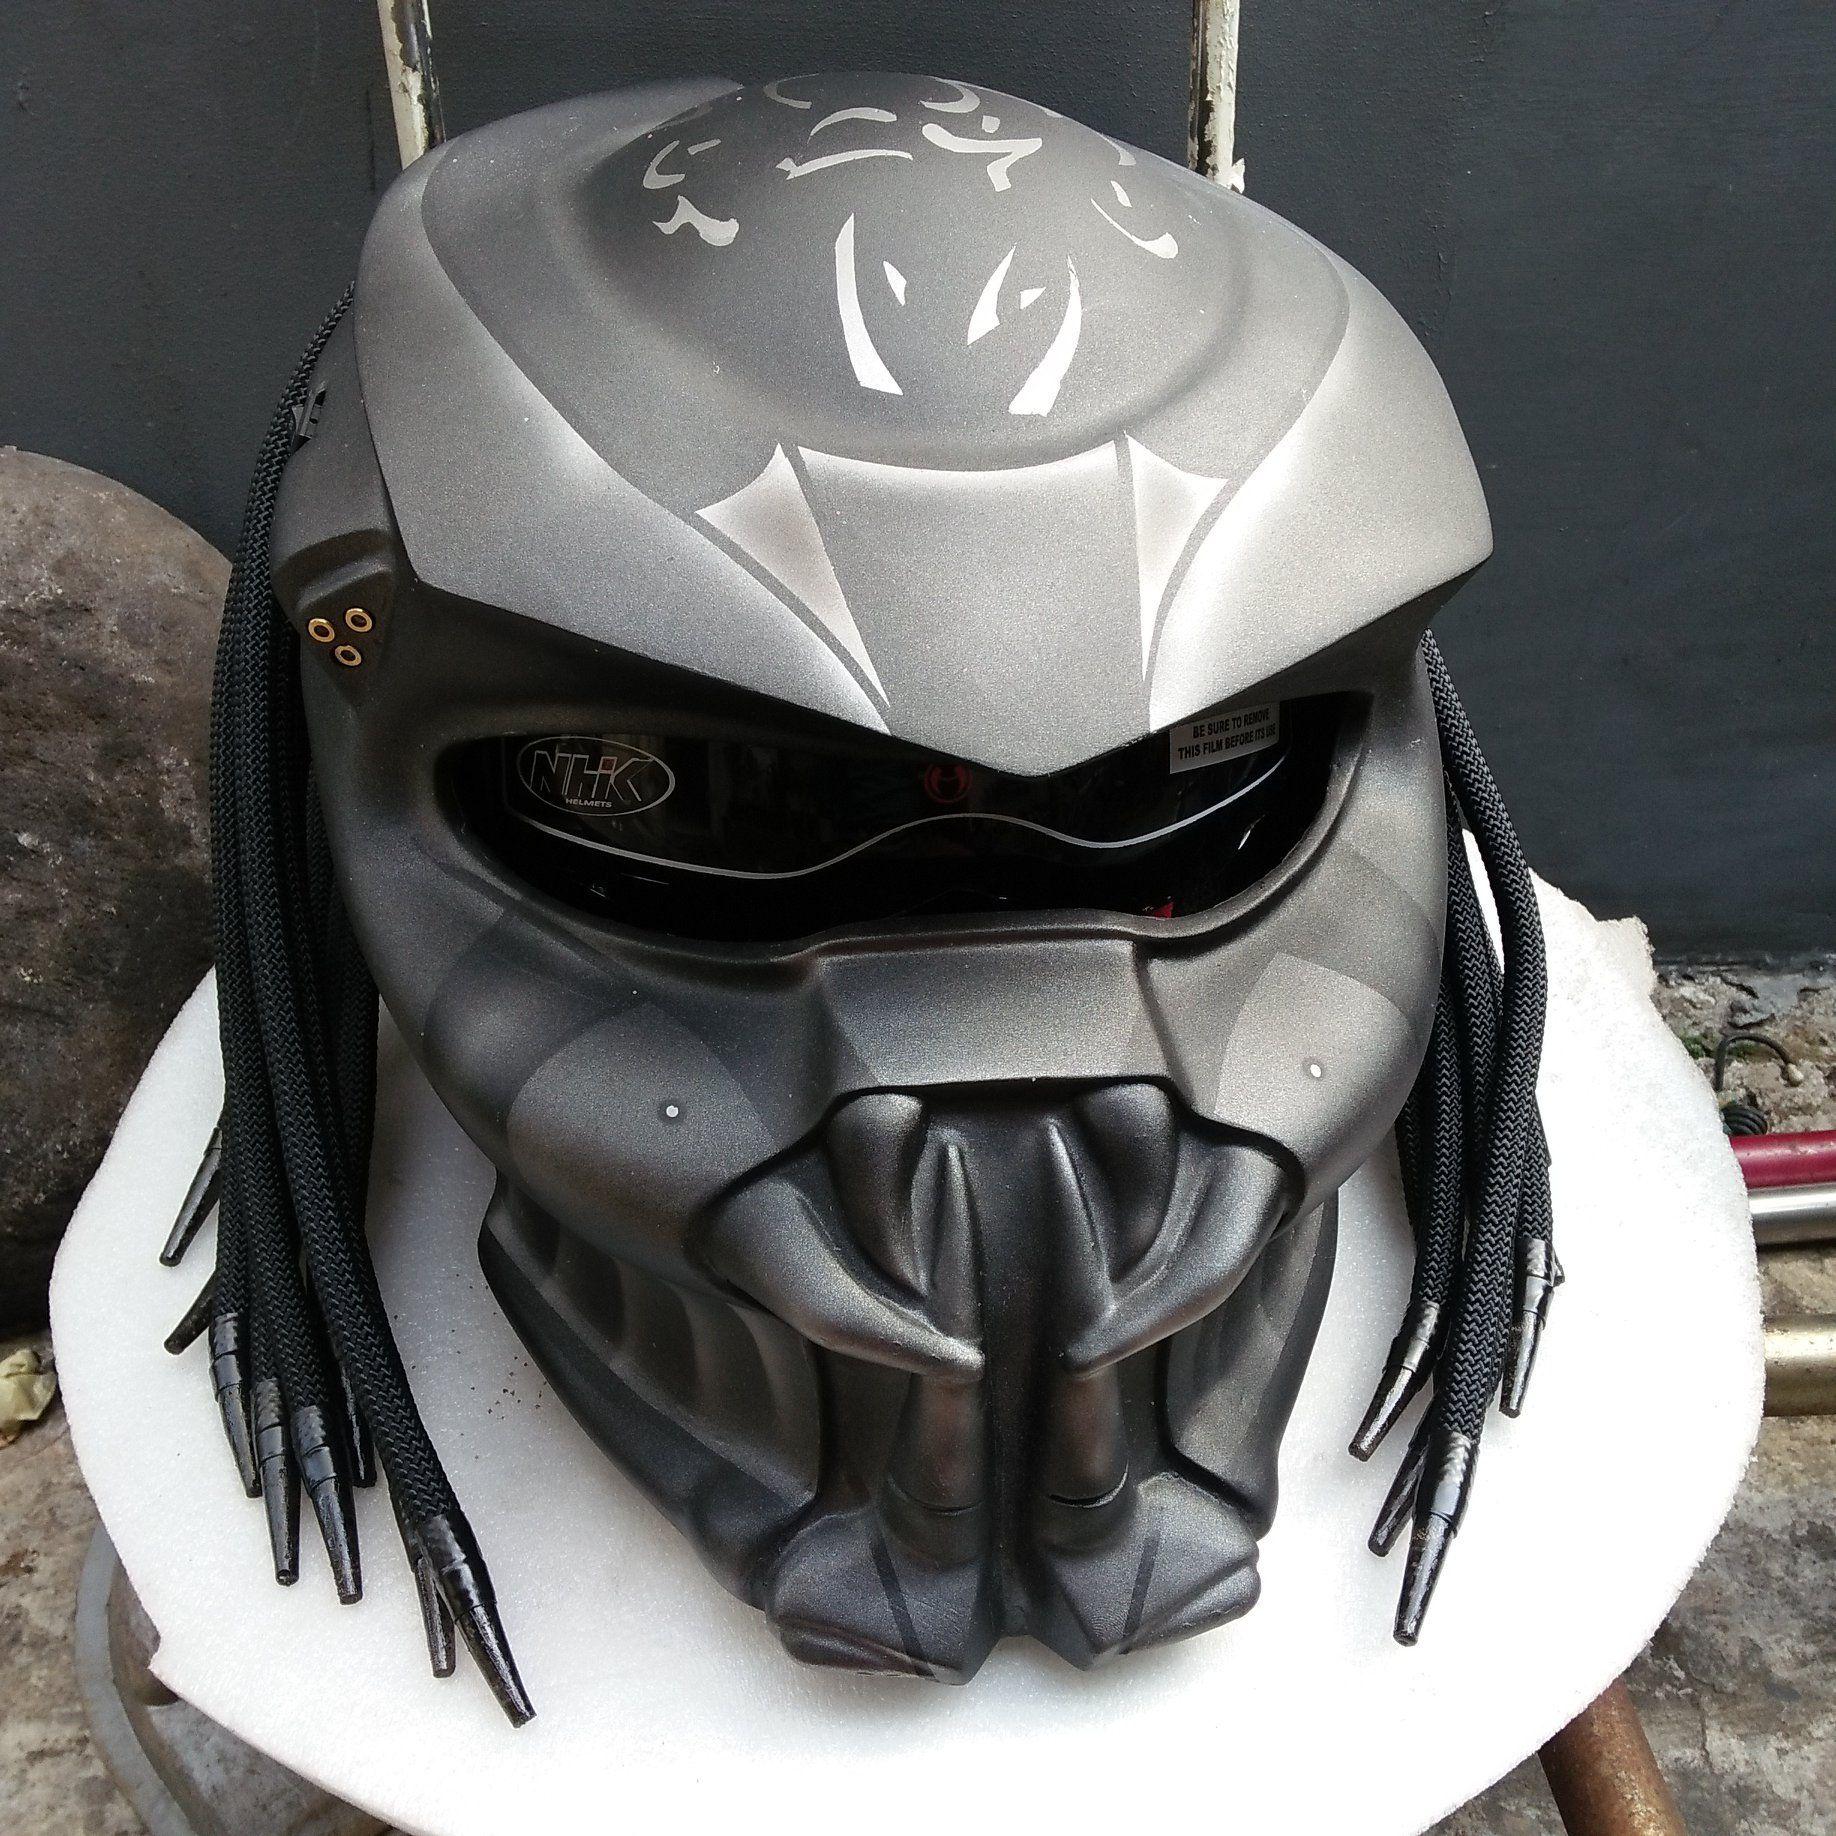 Predator Helmet Street Fighter Style 3 Laser Dark Grey Color Etsy In 2021 Predator Helmet Futuristic Helmet Predator